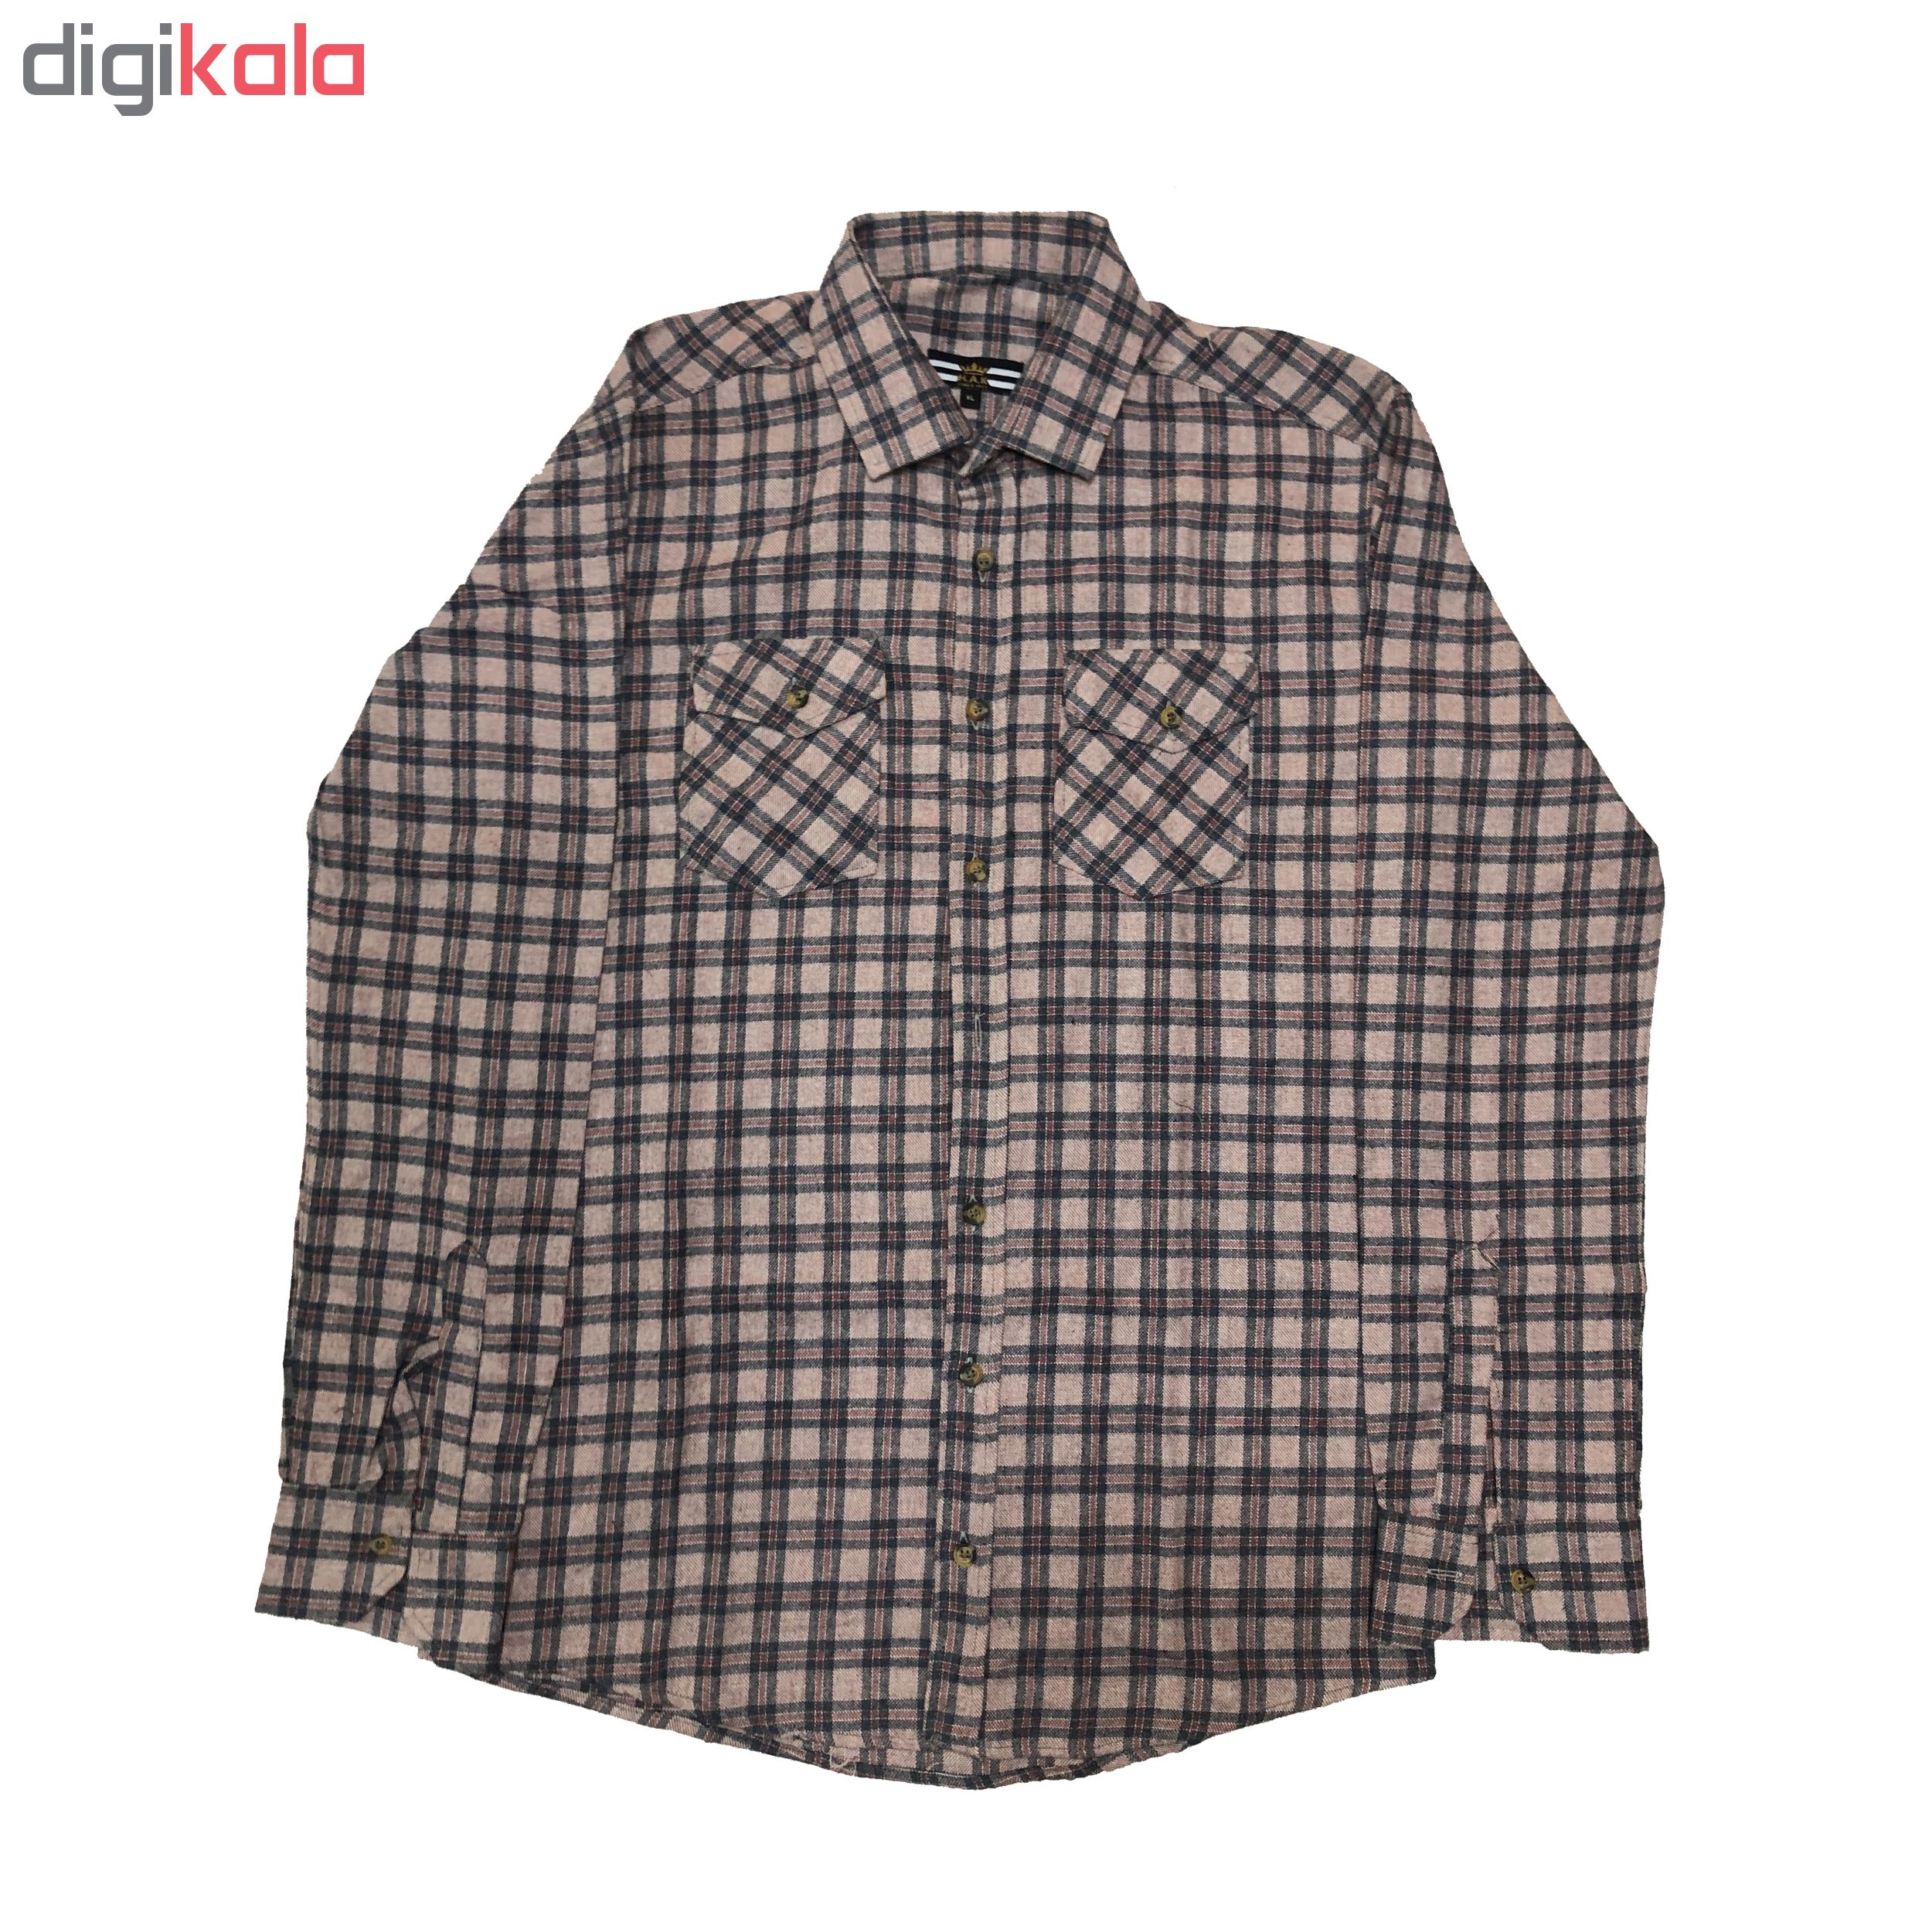 پیراهن مردانه کد 104